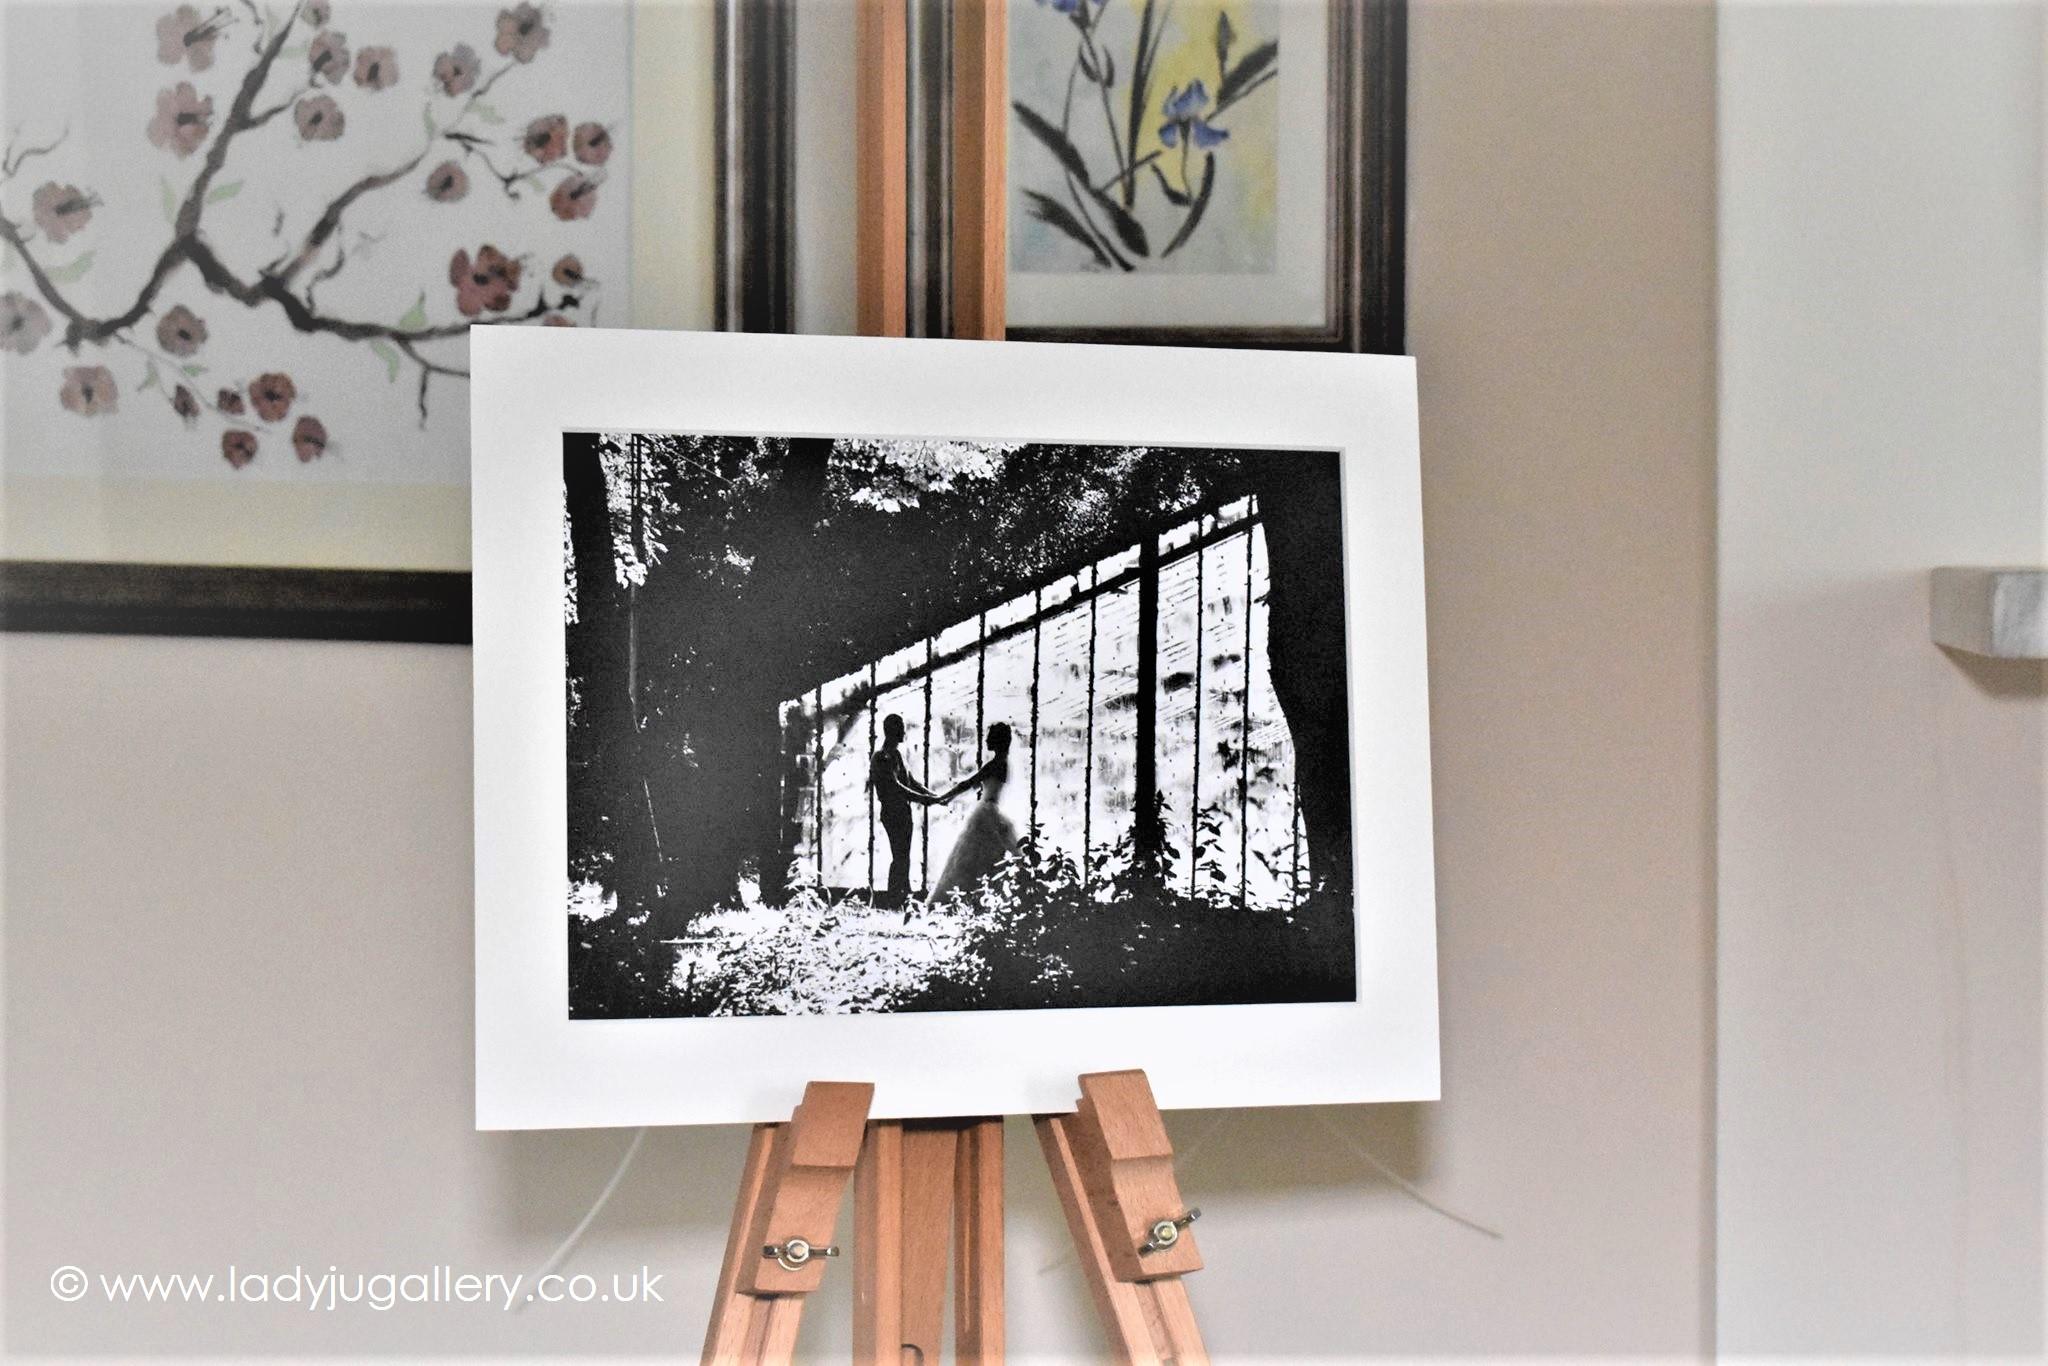 Wedding silhouettes_photo_by_Elena Katrevich_Lady_ju_gallery